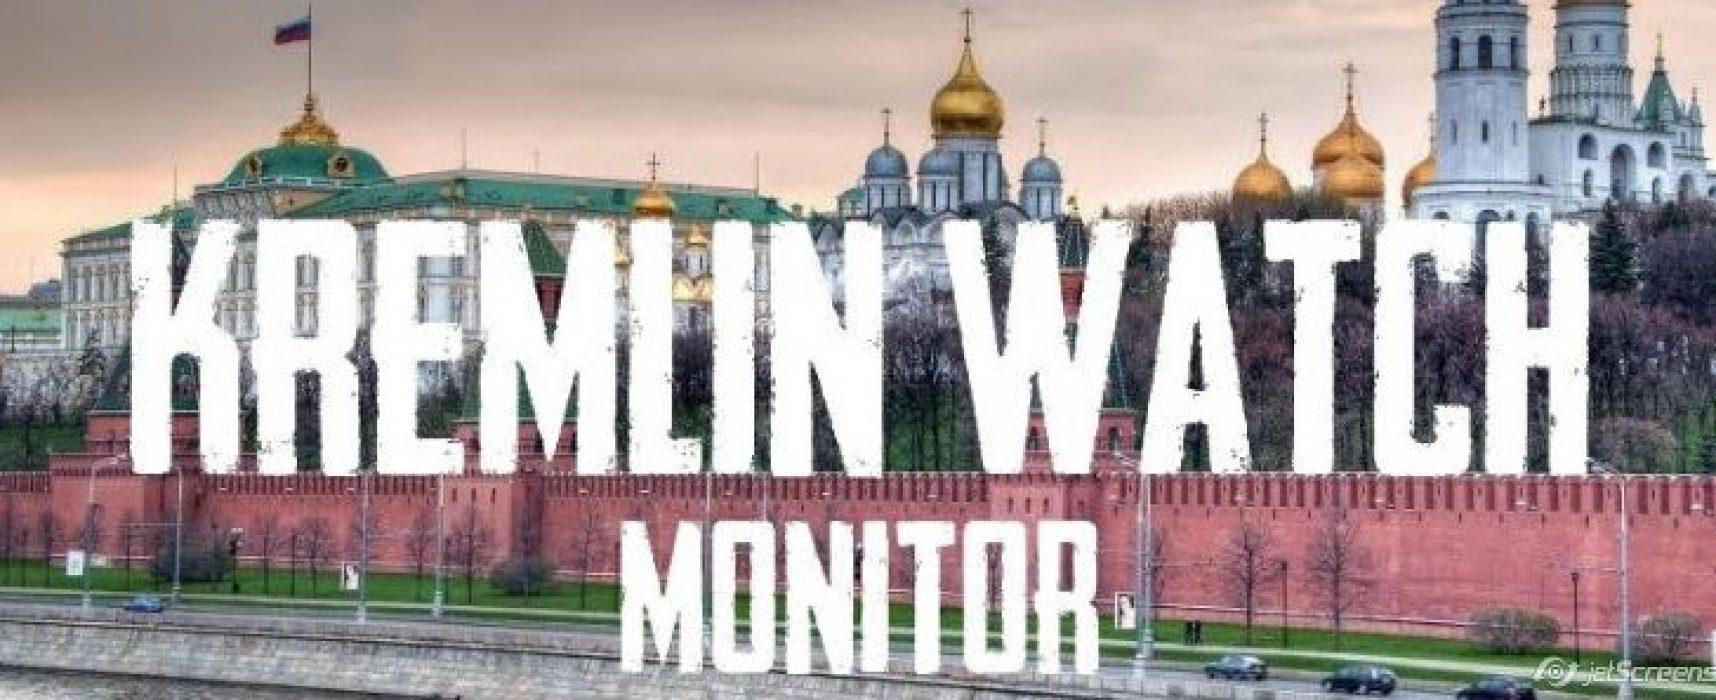 Kremlin Watch Monitor ǀ September 19, 2017